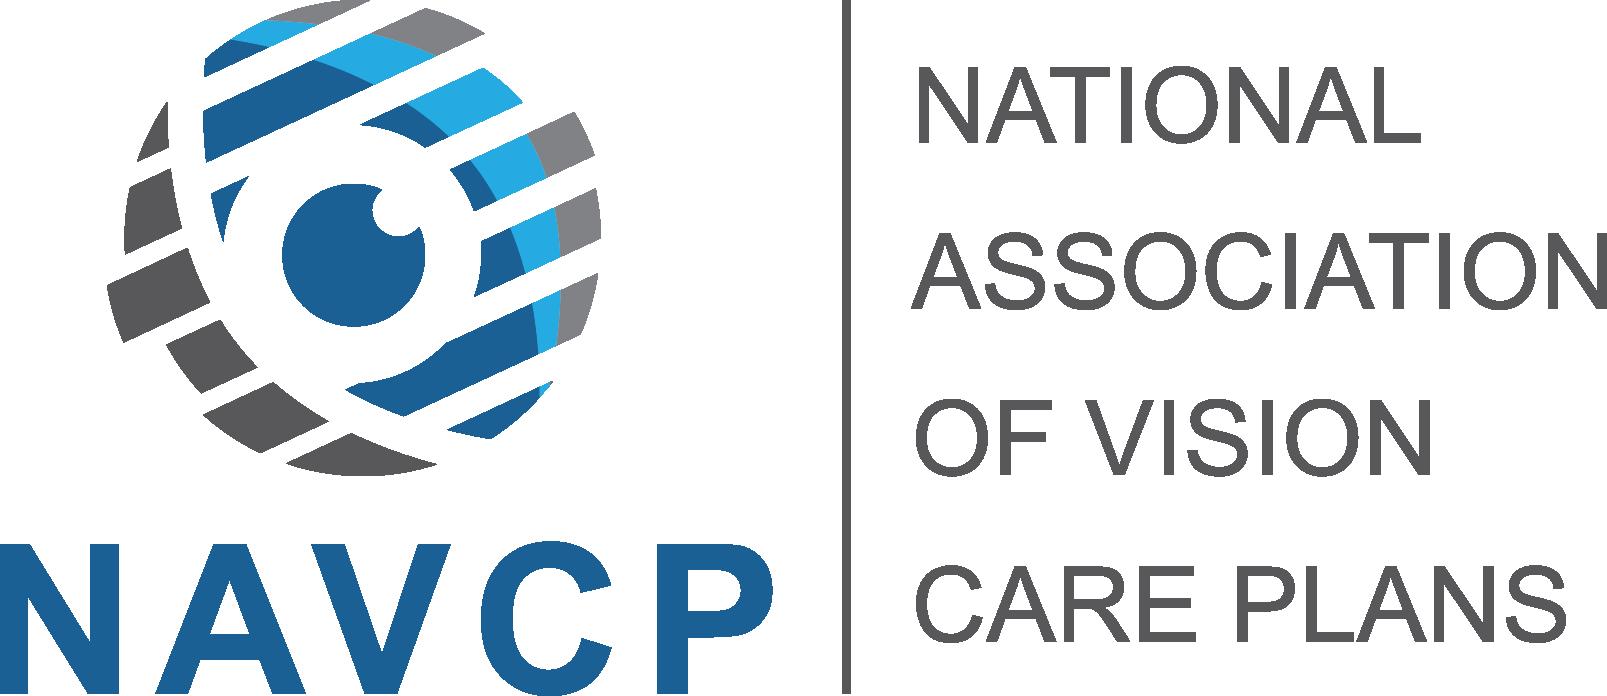 National Association of Vision Care Plans